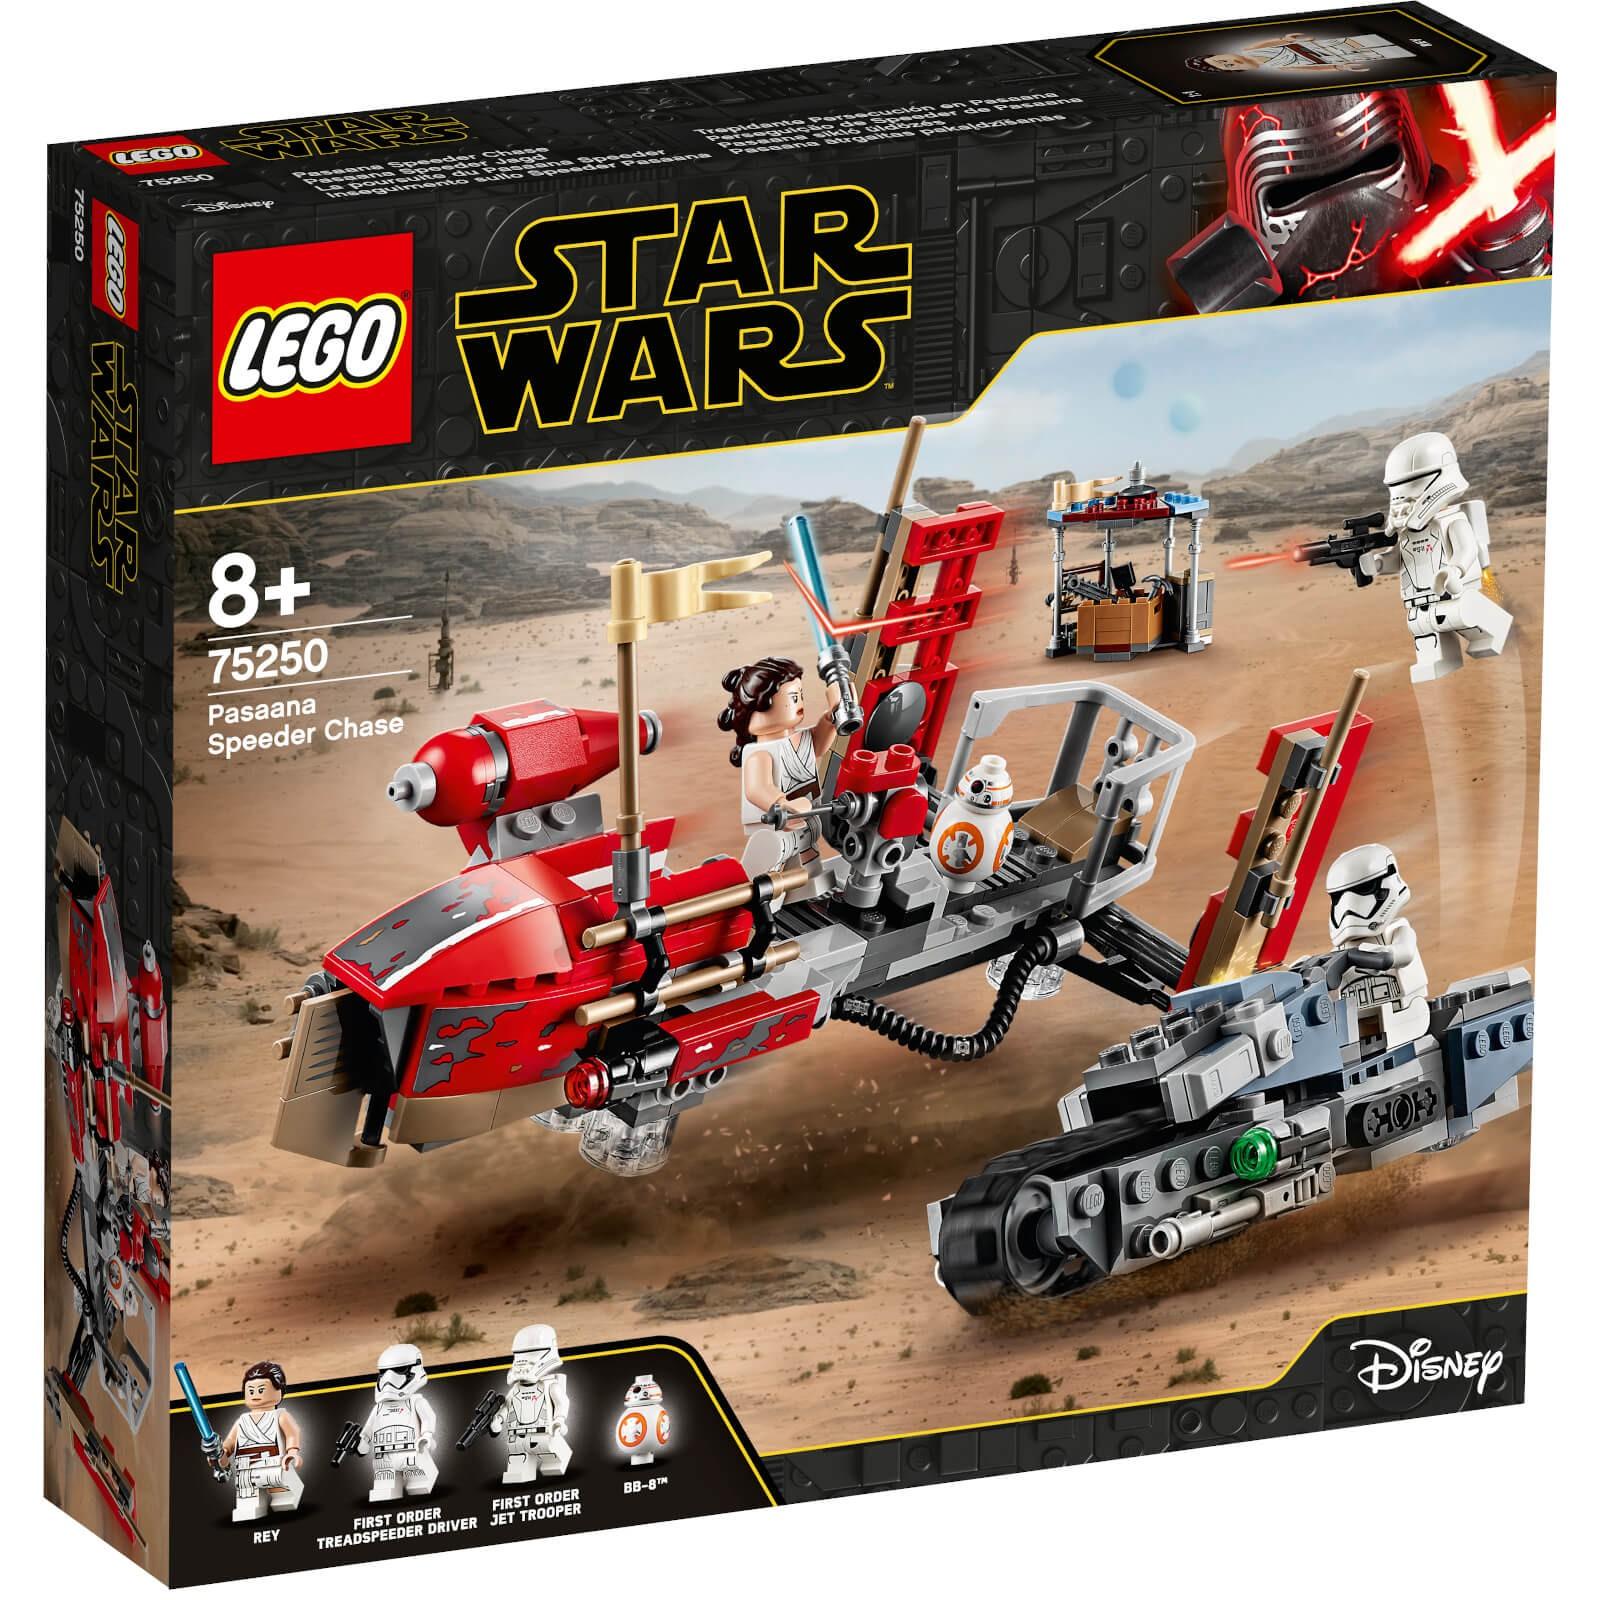 LEGO 乐高 星球大战系列 75250 帕萨纳飞艇追击